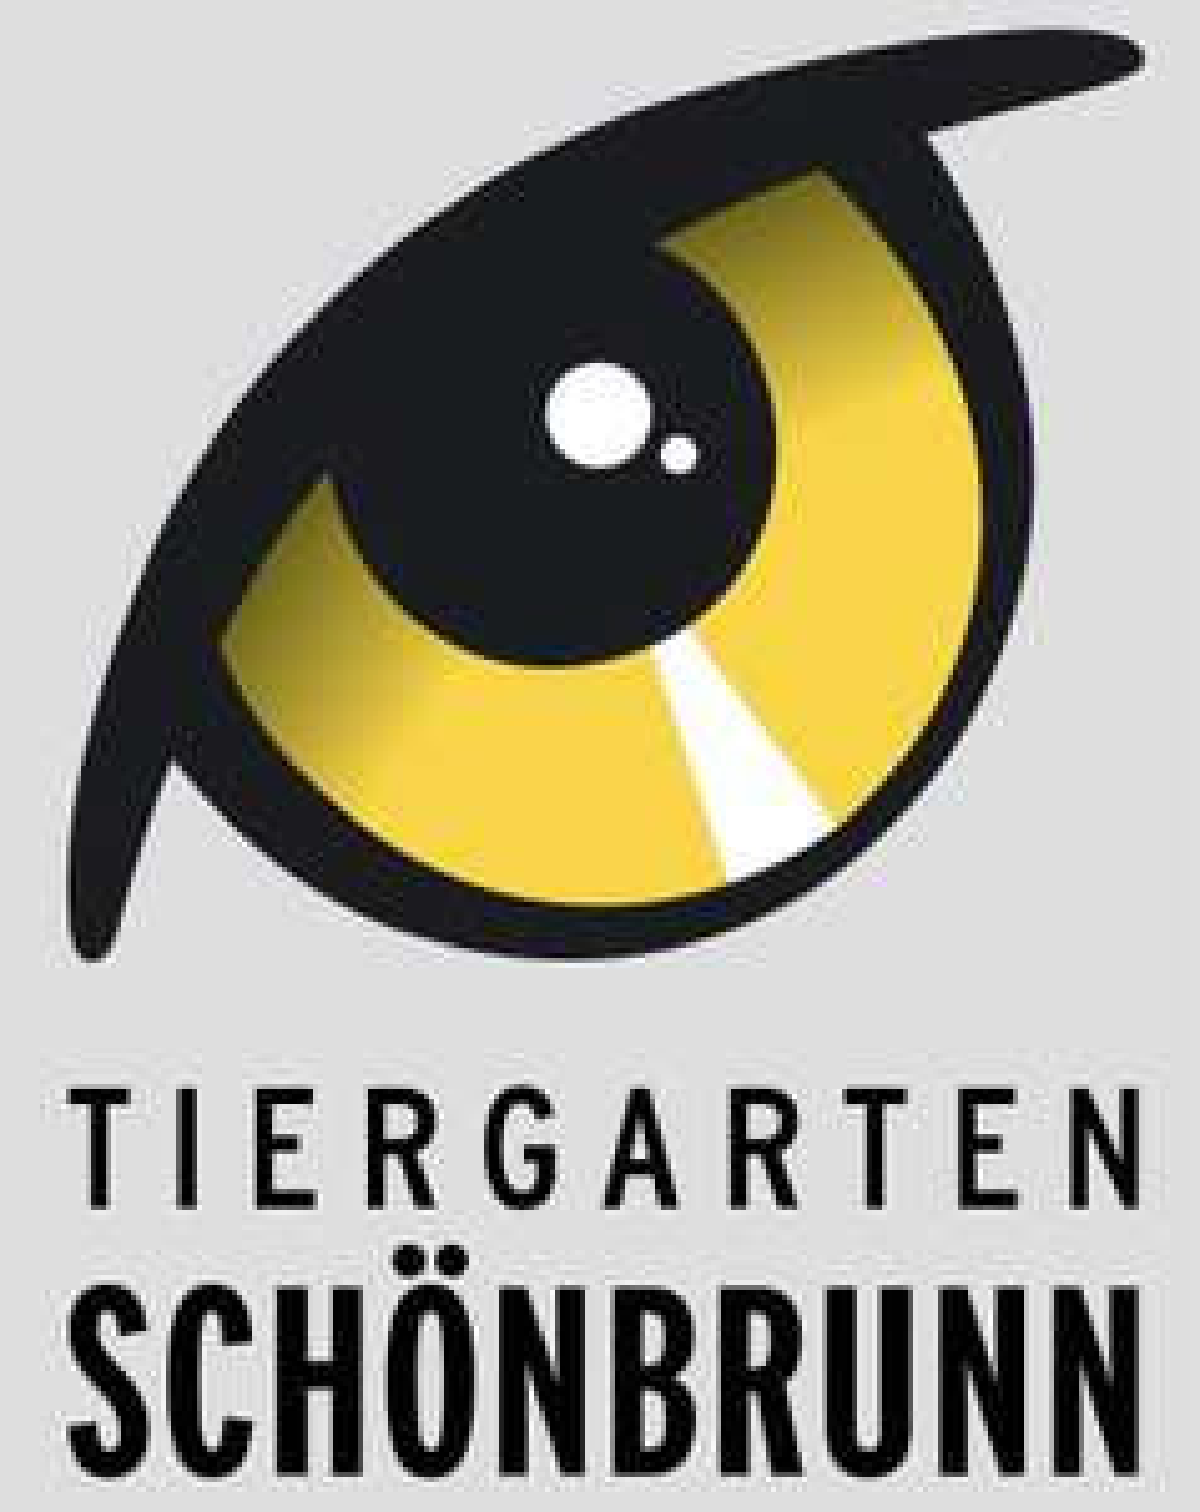 Tiergarten Schönbrunn - 1+1 Gratis Tickets - am 14.2.2019